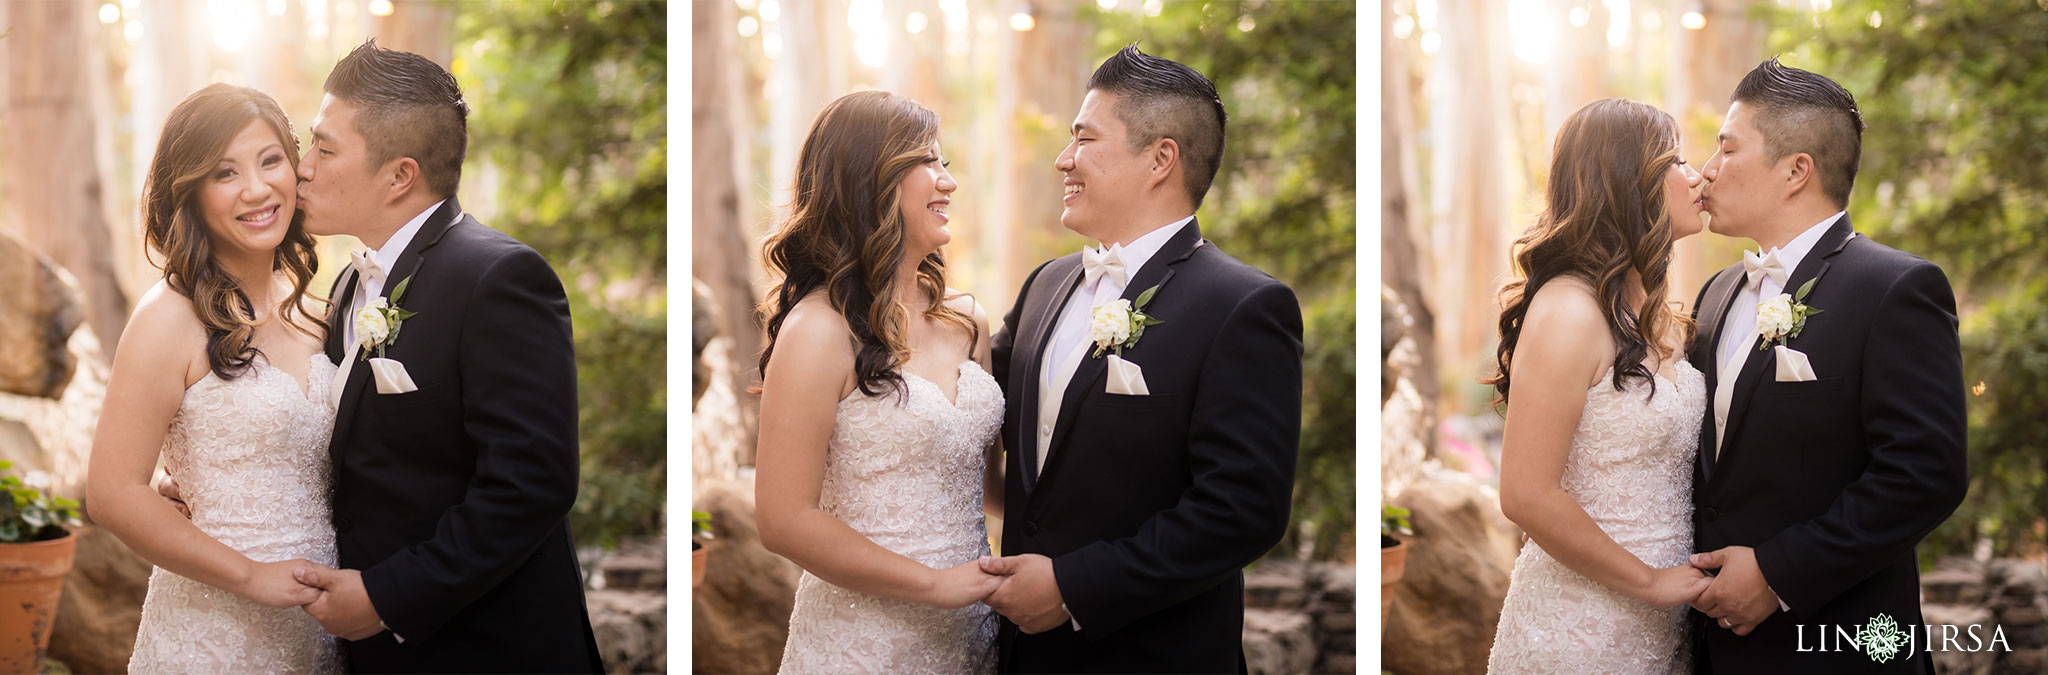 22 calamigos ranch malibu wedding photography